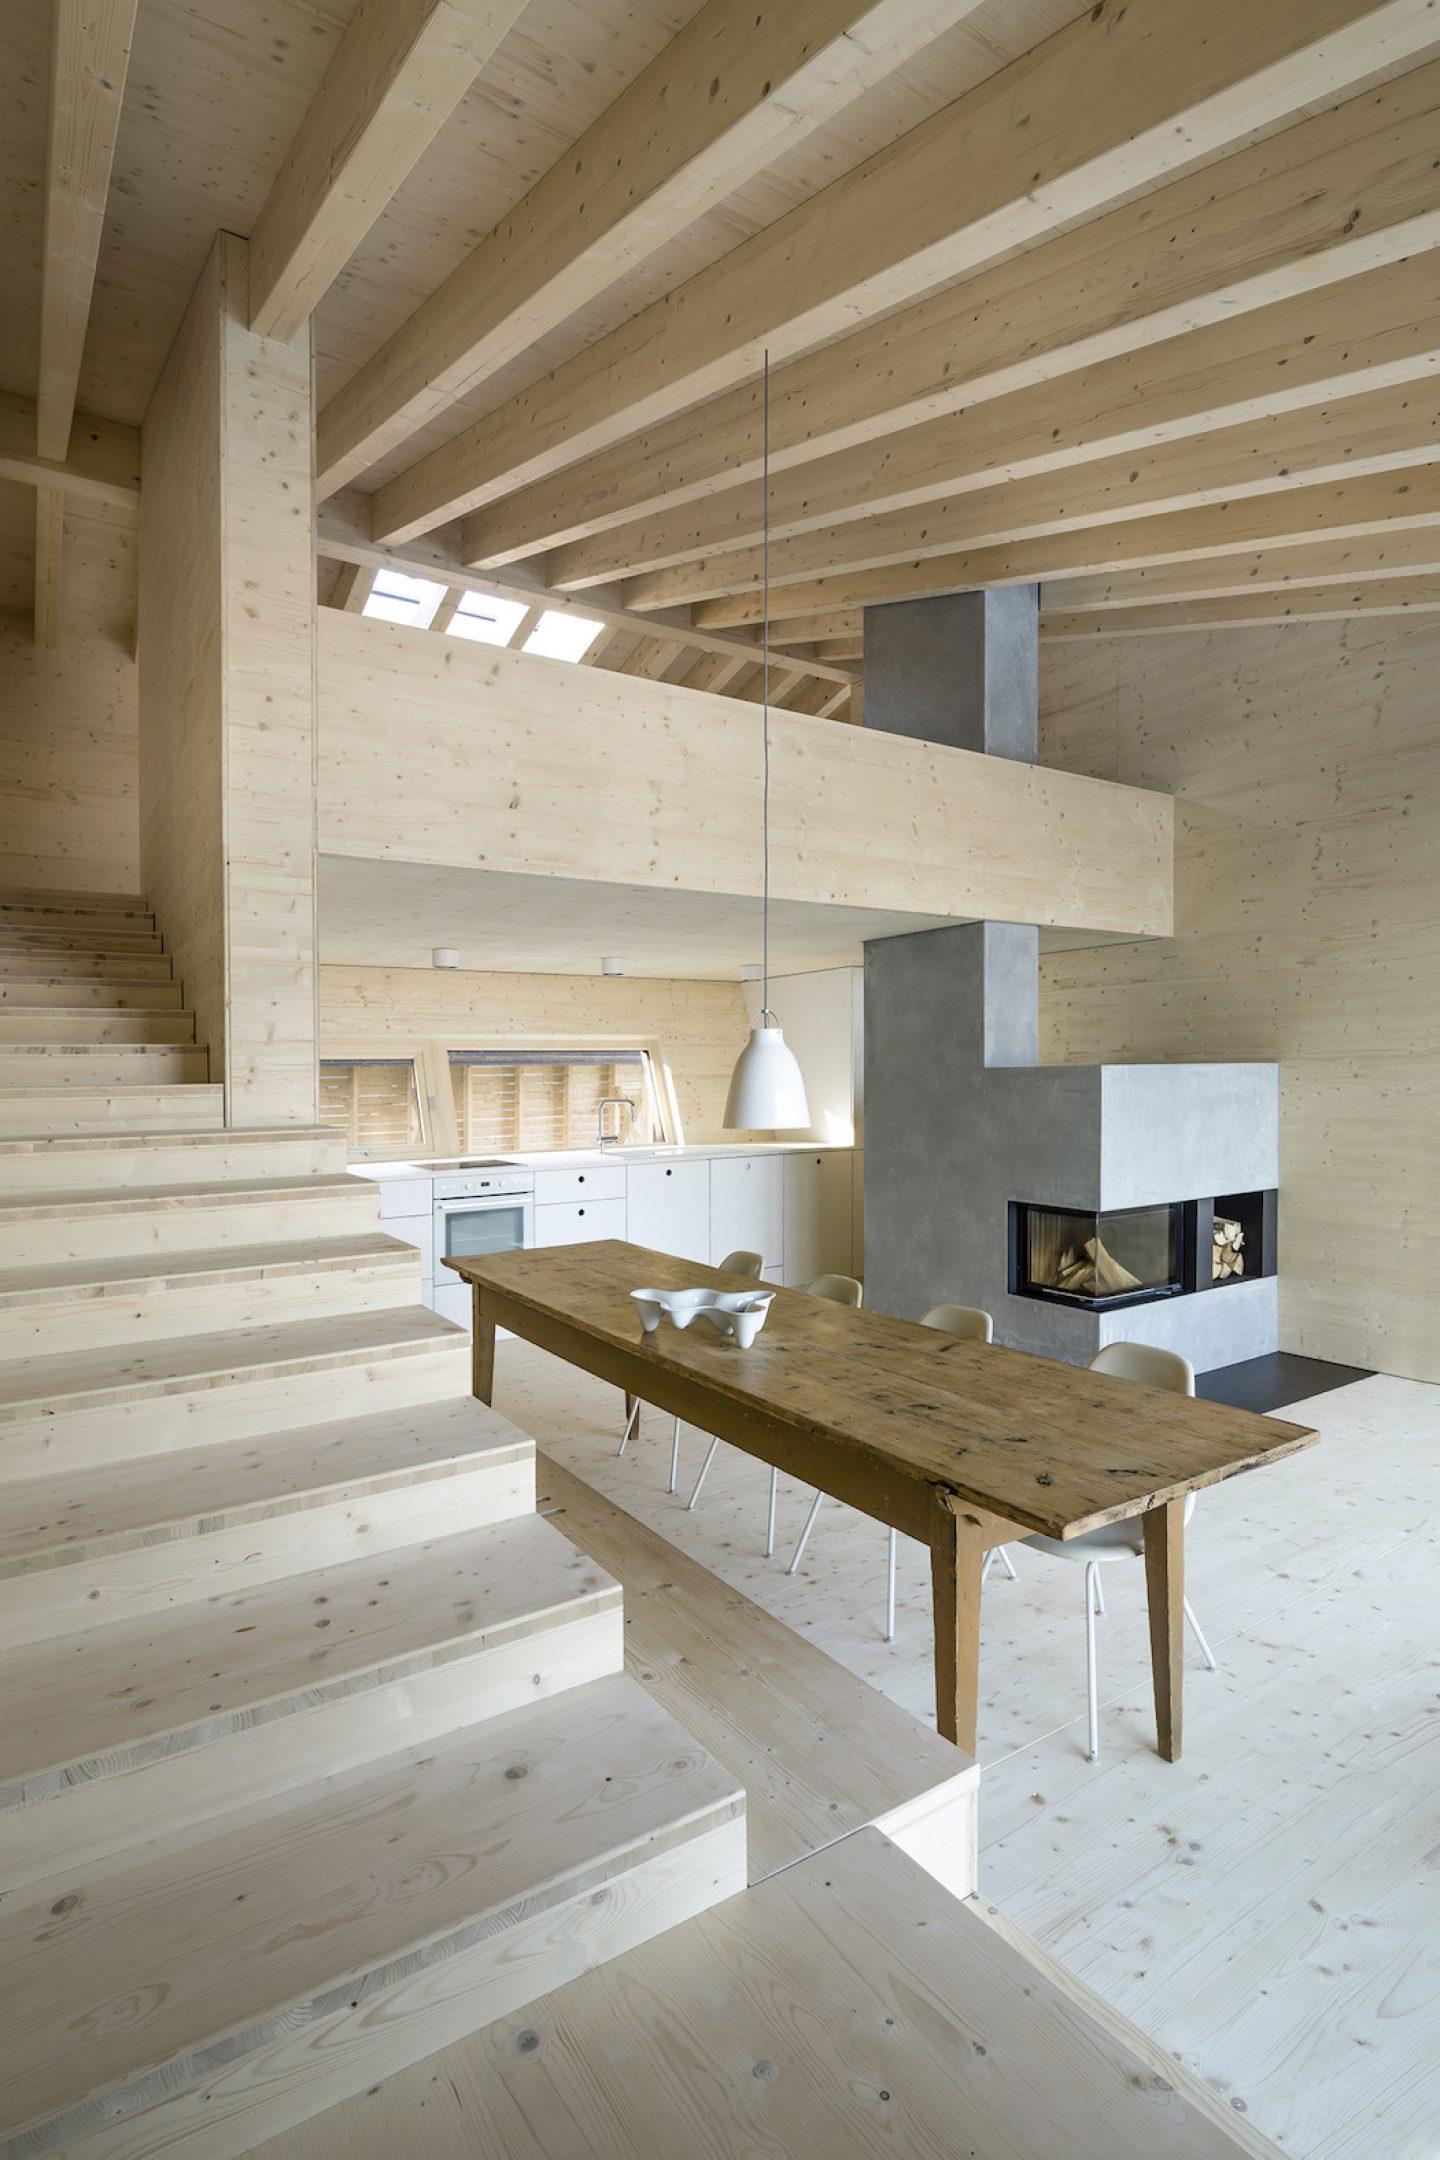 architecture_studioyonder_07